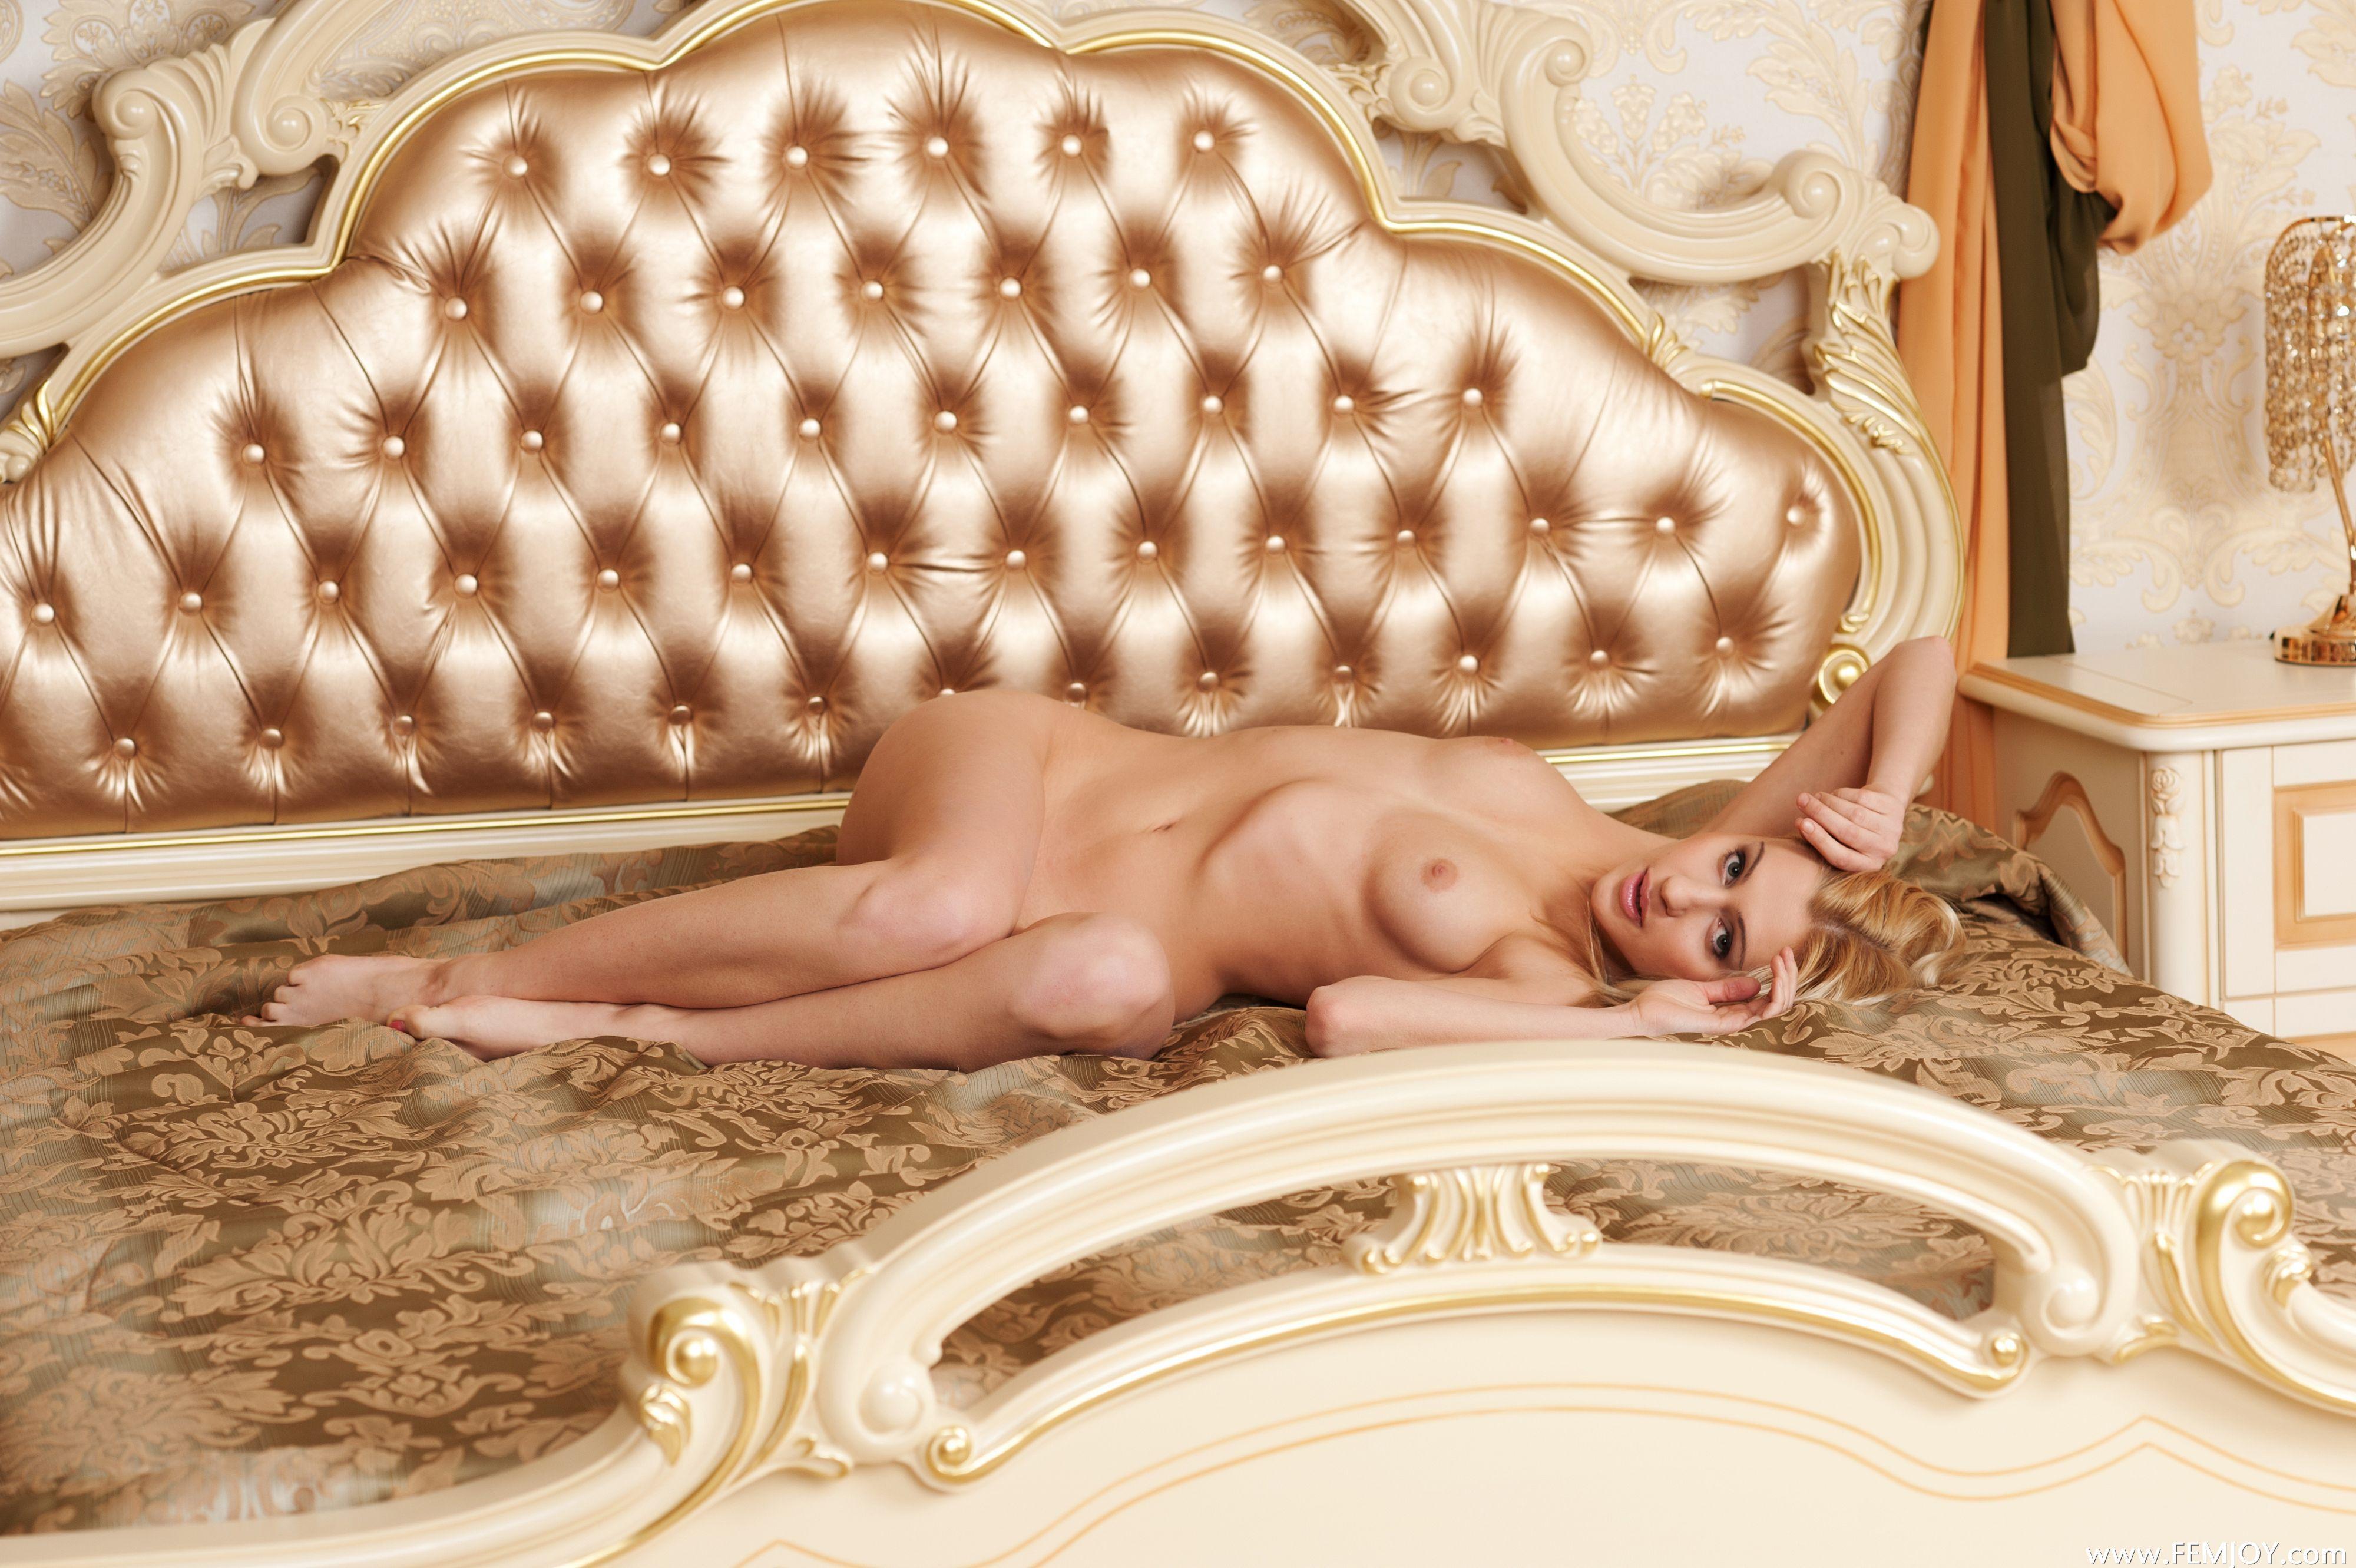 http://i5.imageban.ru/out/2013/11/13/740e1c51f0b4093905c413d65cd1dda5.jpg